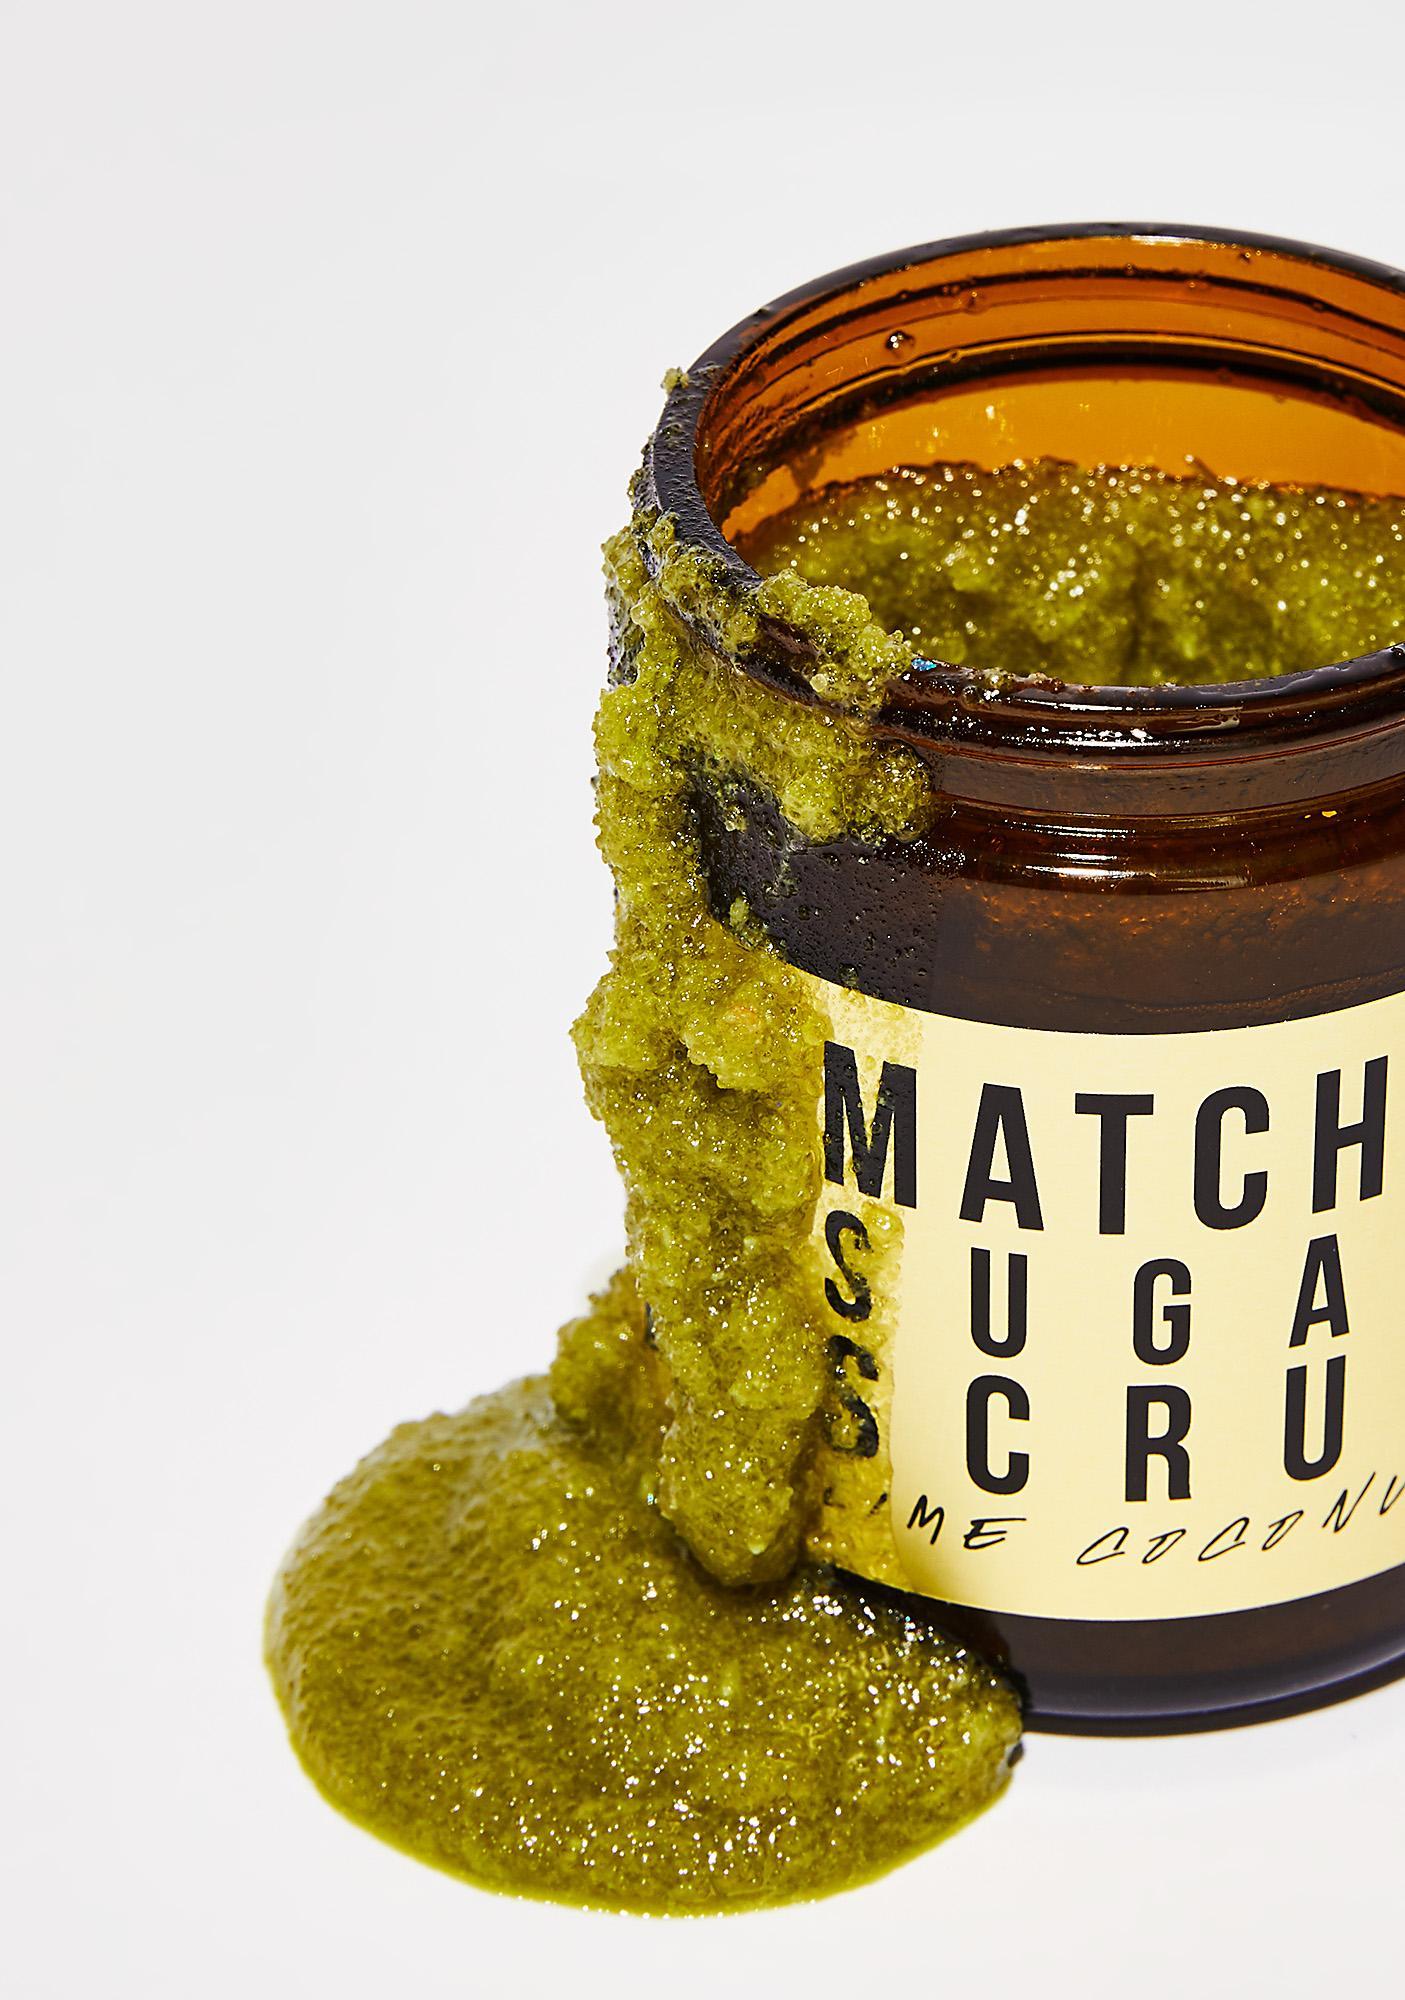 URB APOTHECARY Matcha Sugar Scrub